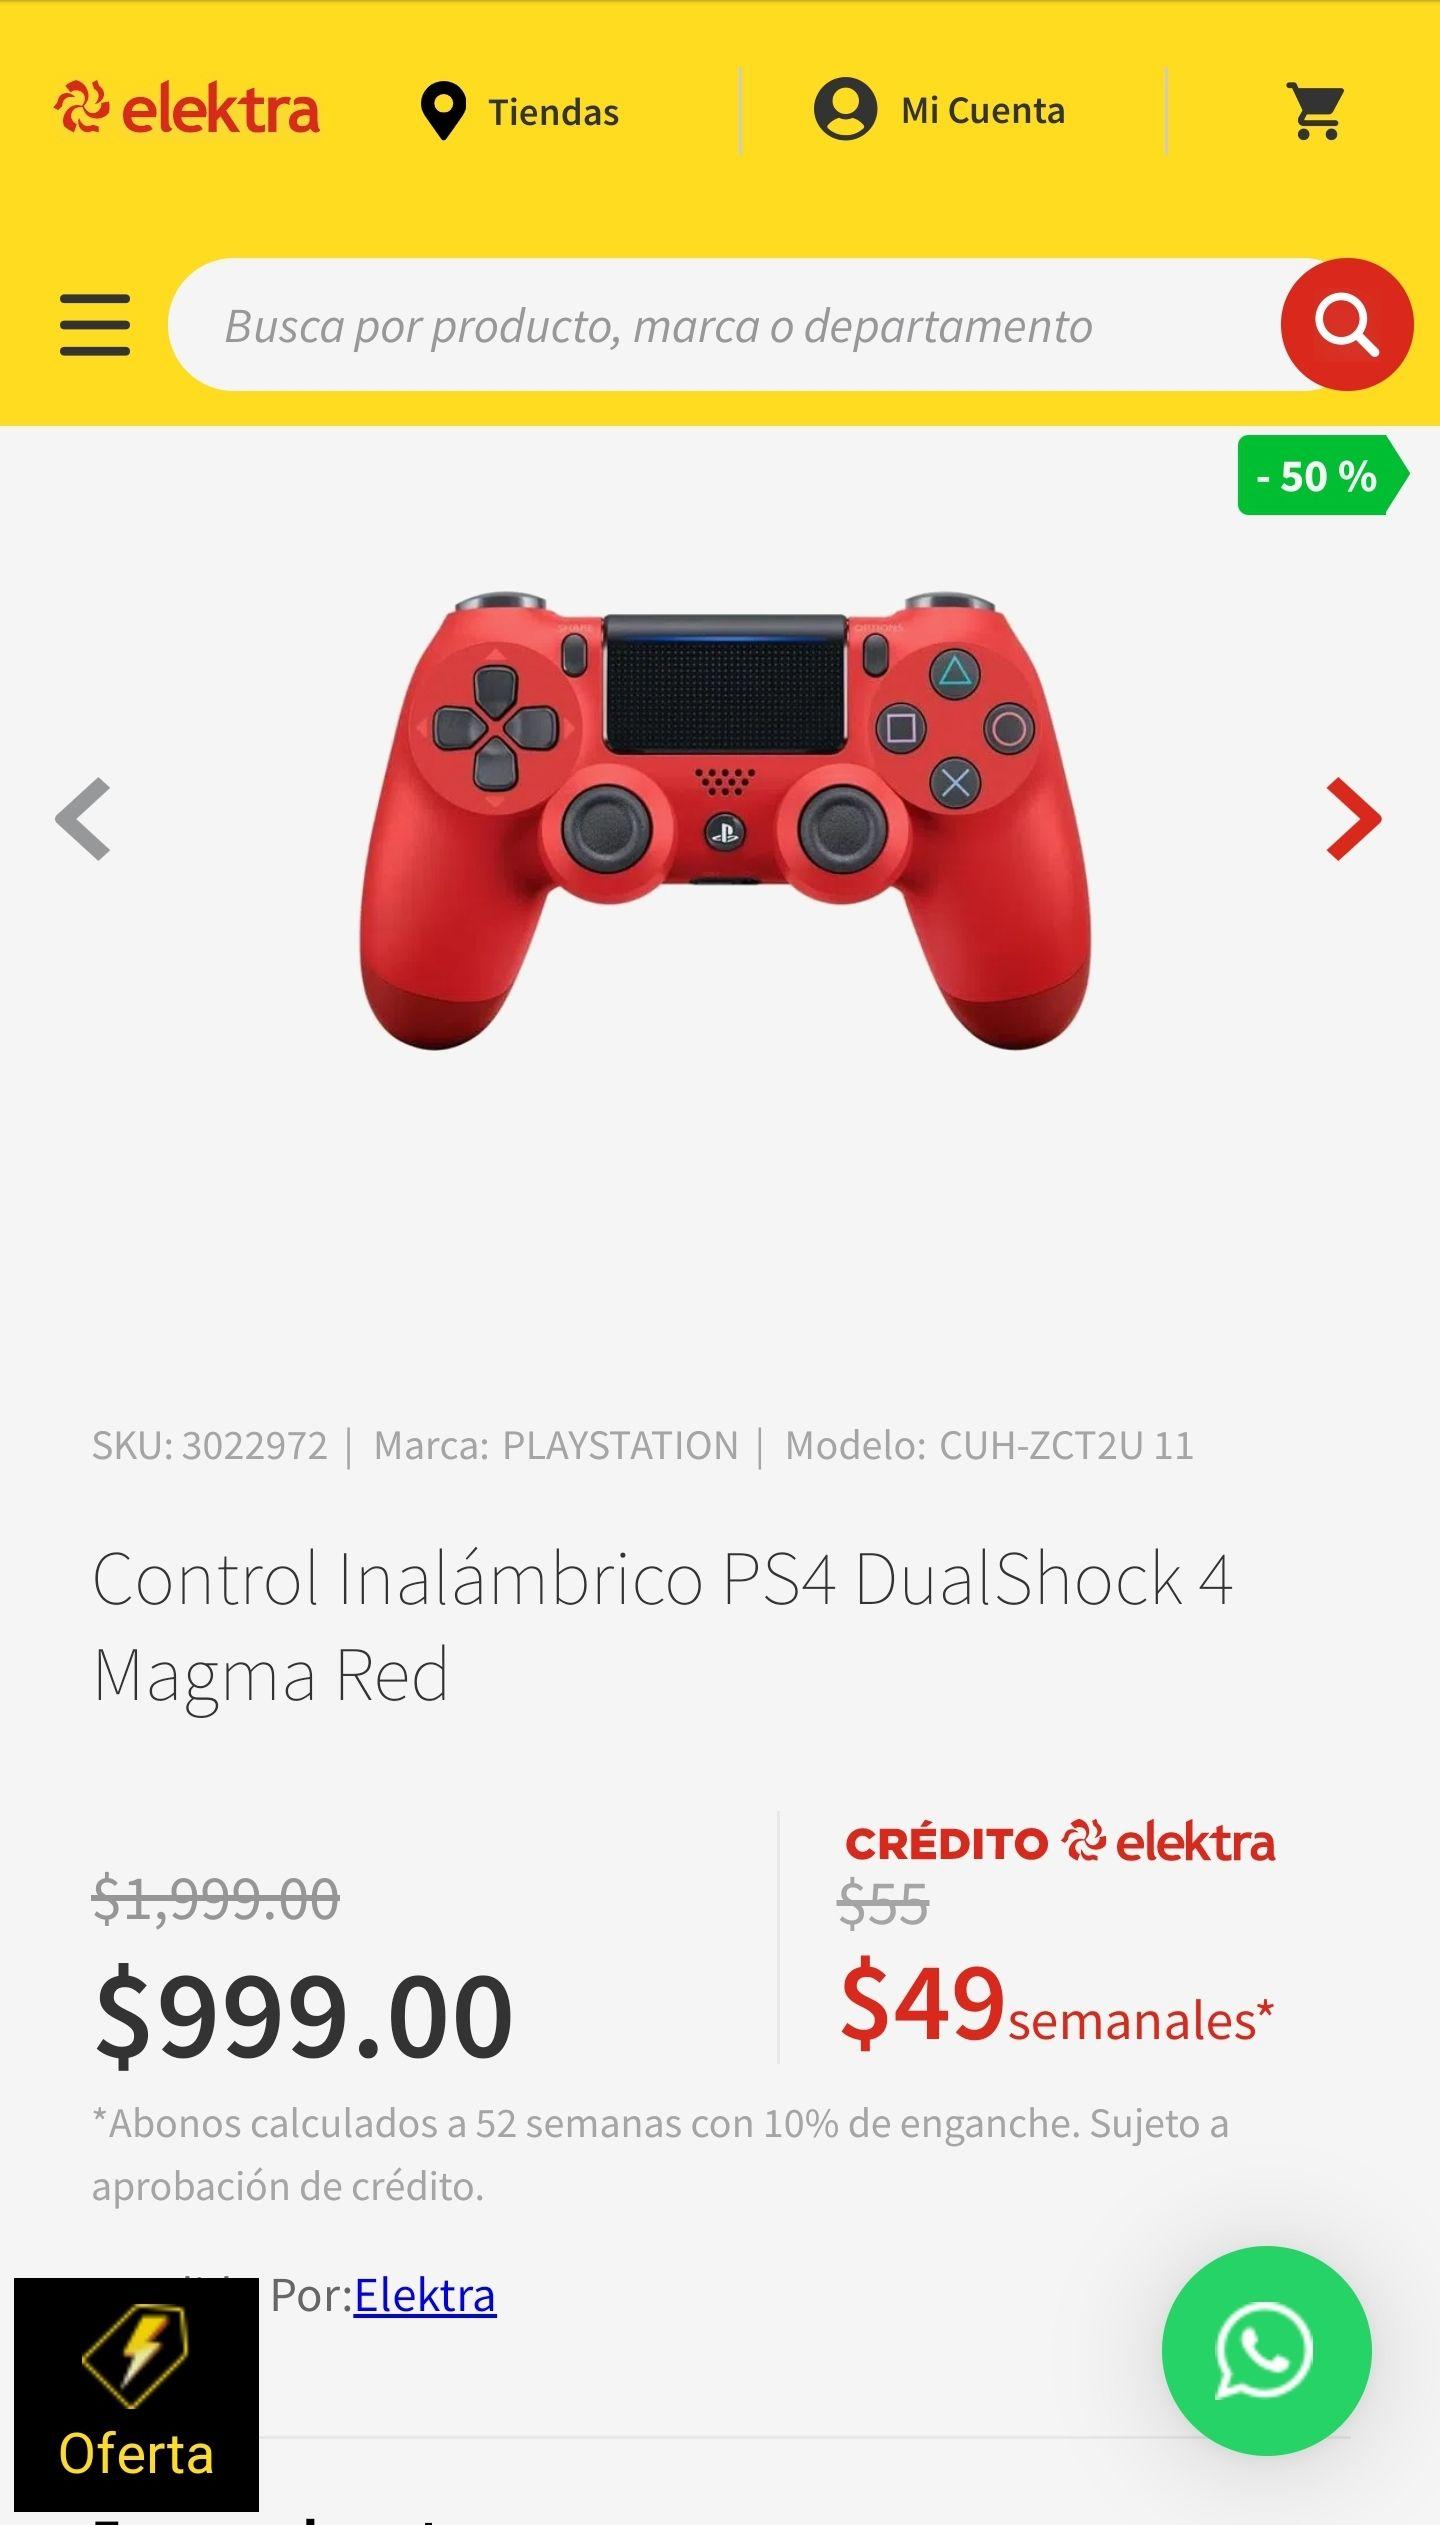 Elektra: Control Inalámbrico PS4 DualShock 4 Magma Red